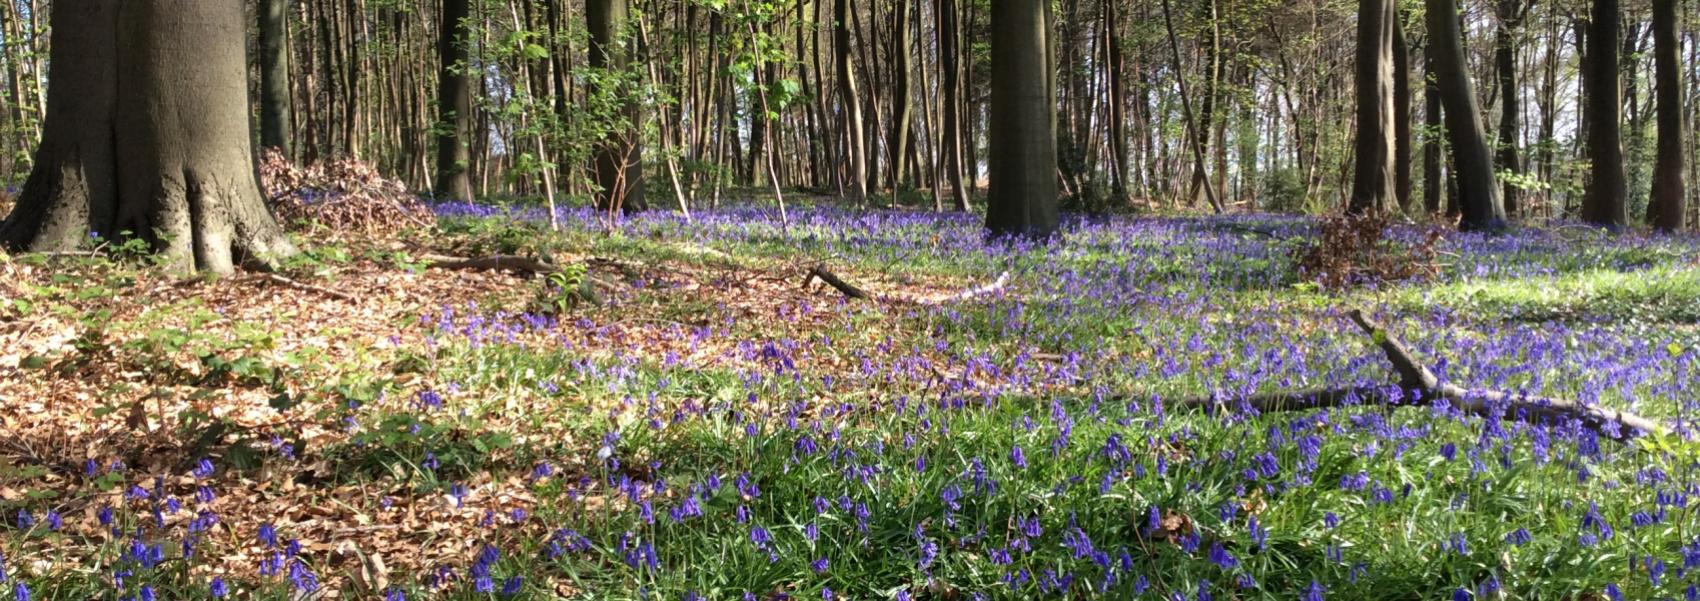 paarse bloemenweide in het bos